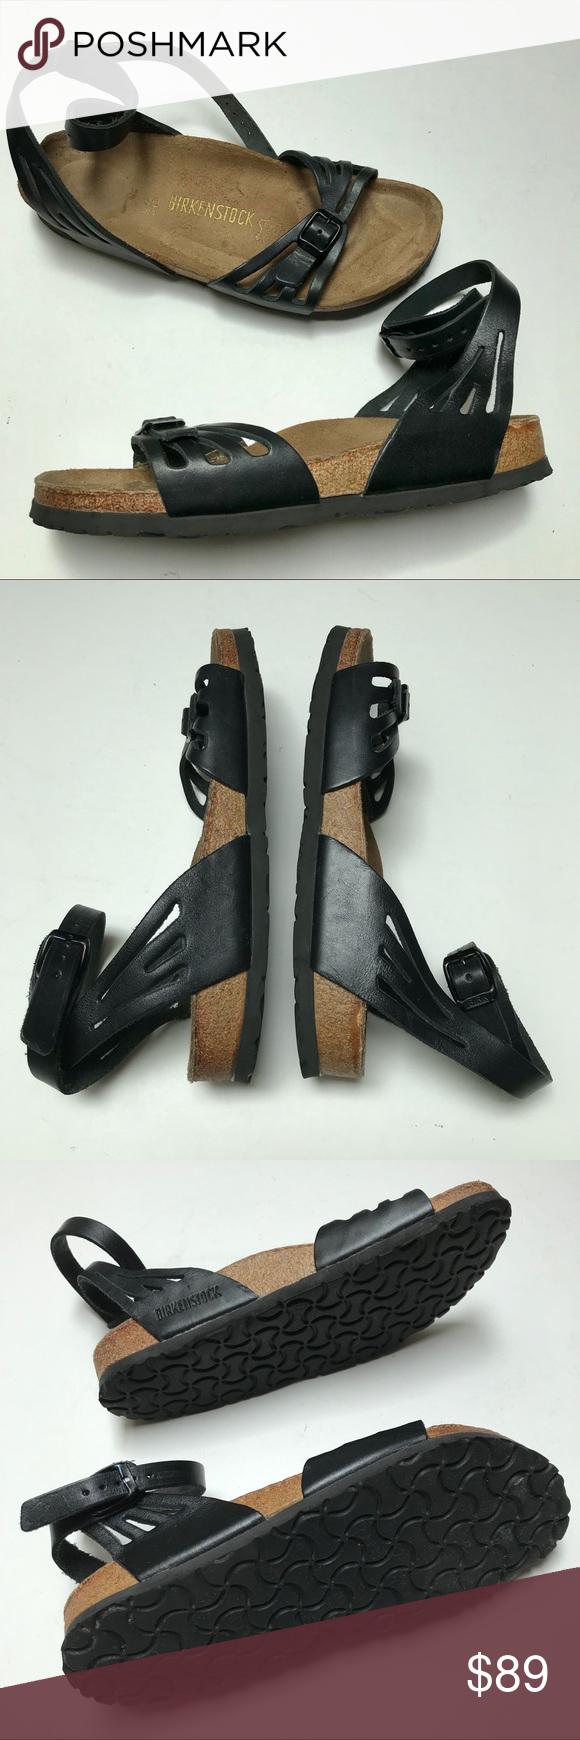 Birkenstock Sandals 40 9.5 10 Palma Leather Rare